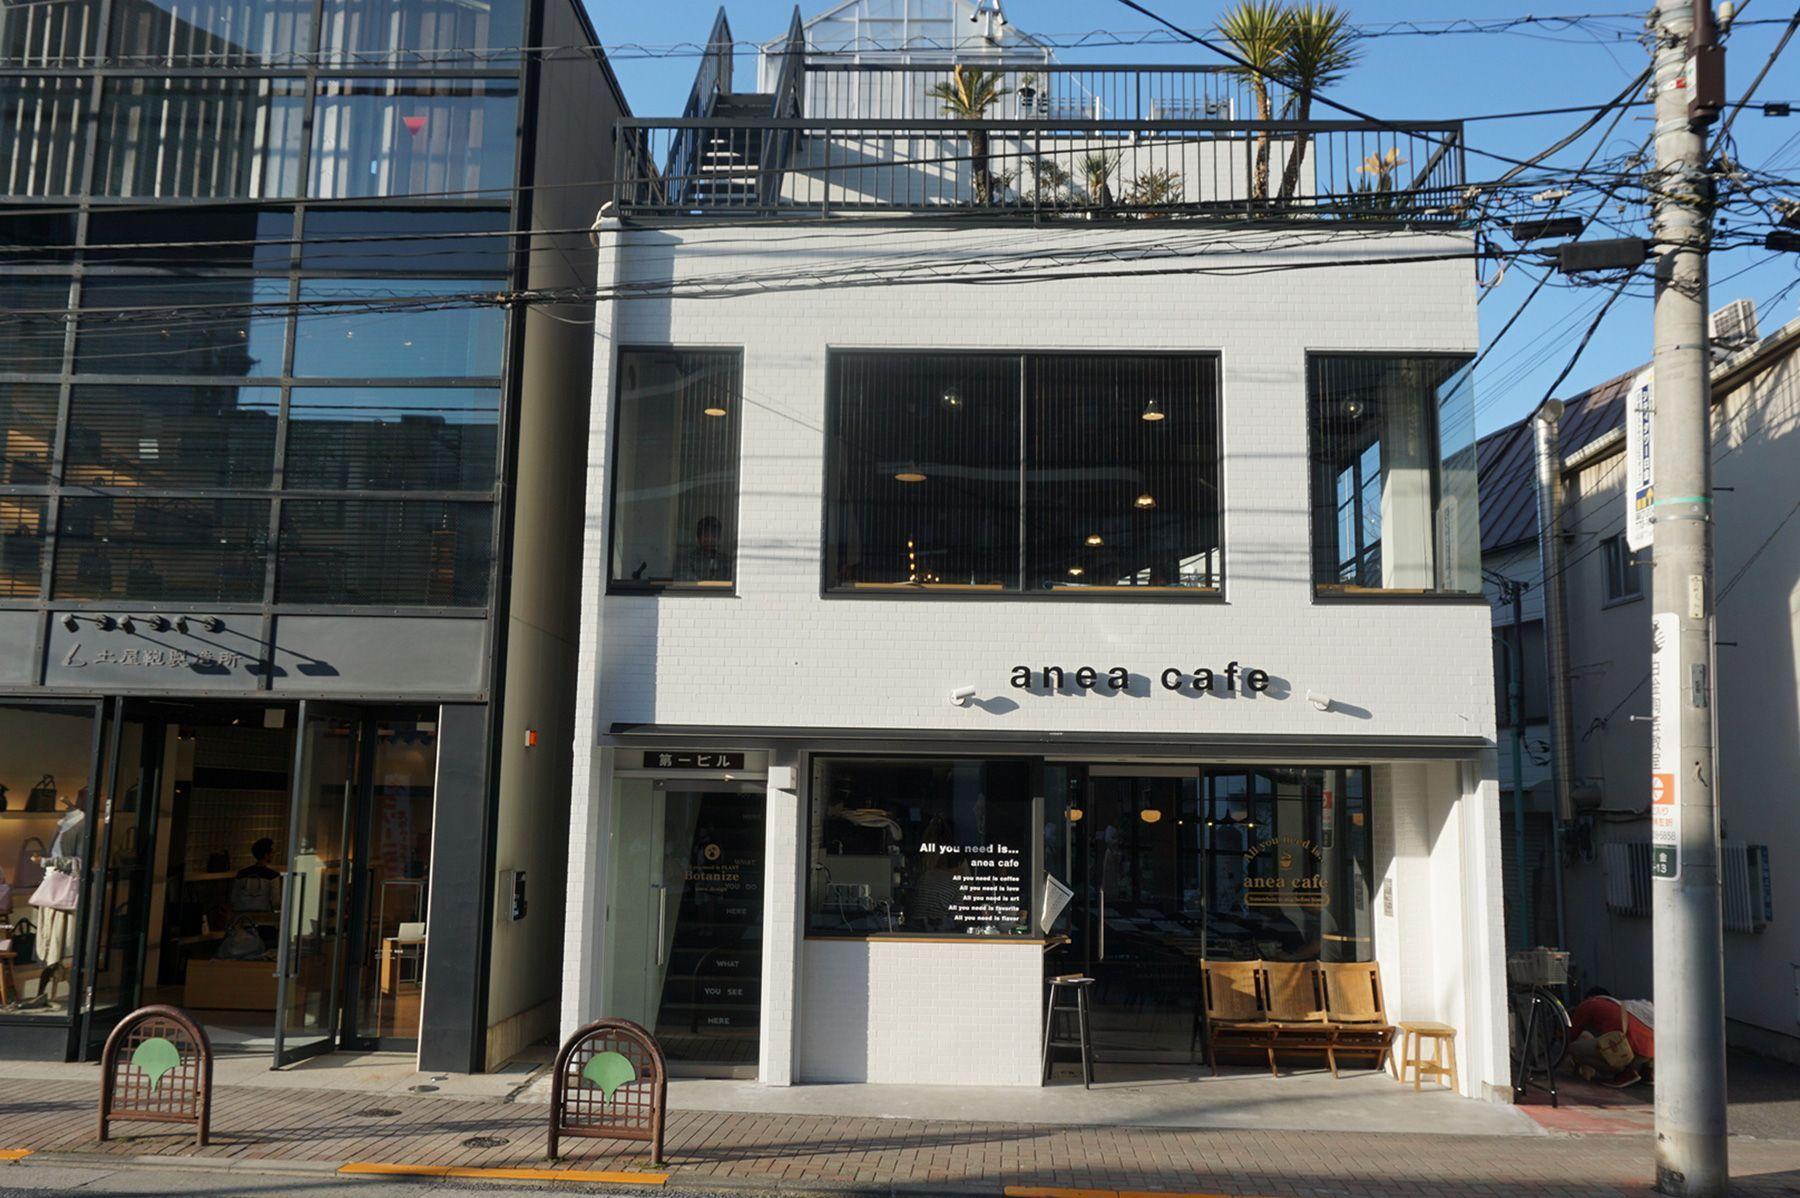 anea cafe/店舗 (アネア カフェ)外観